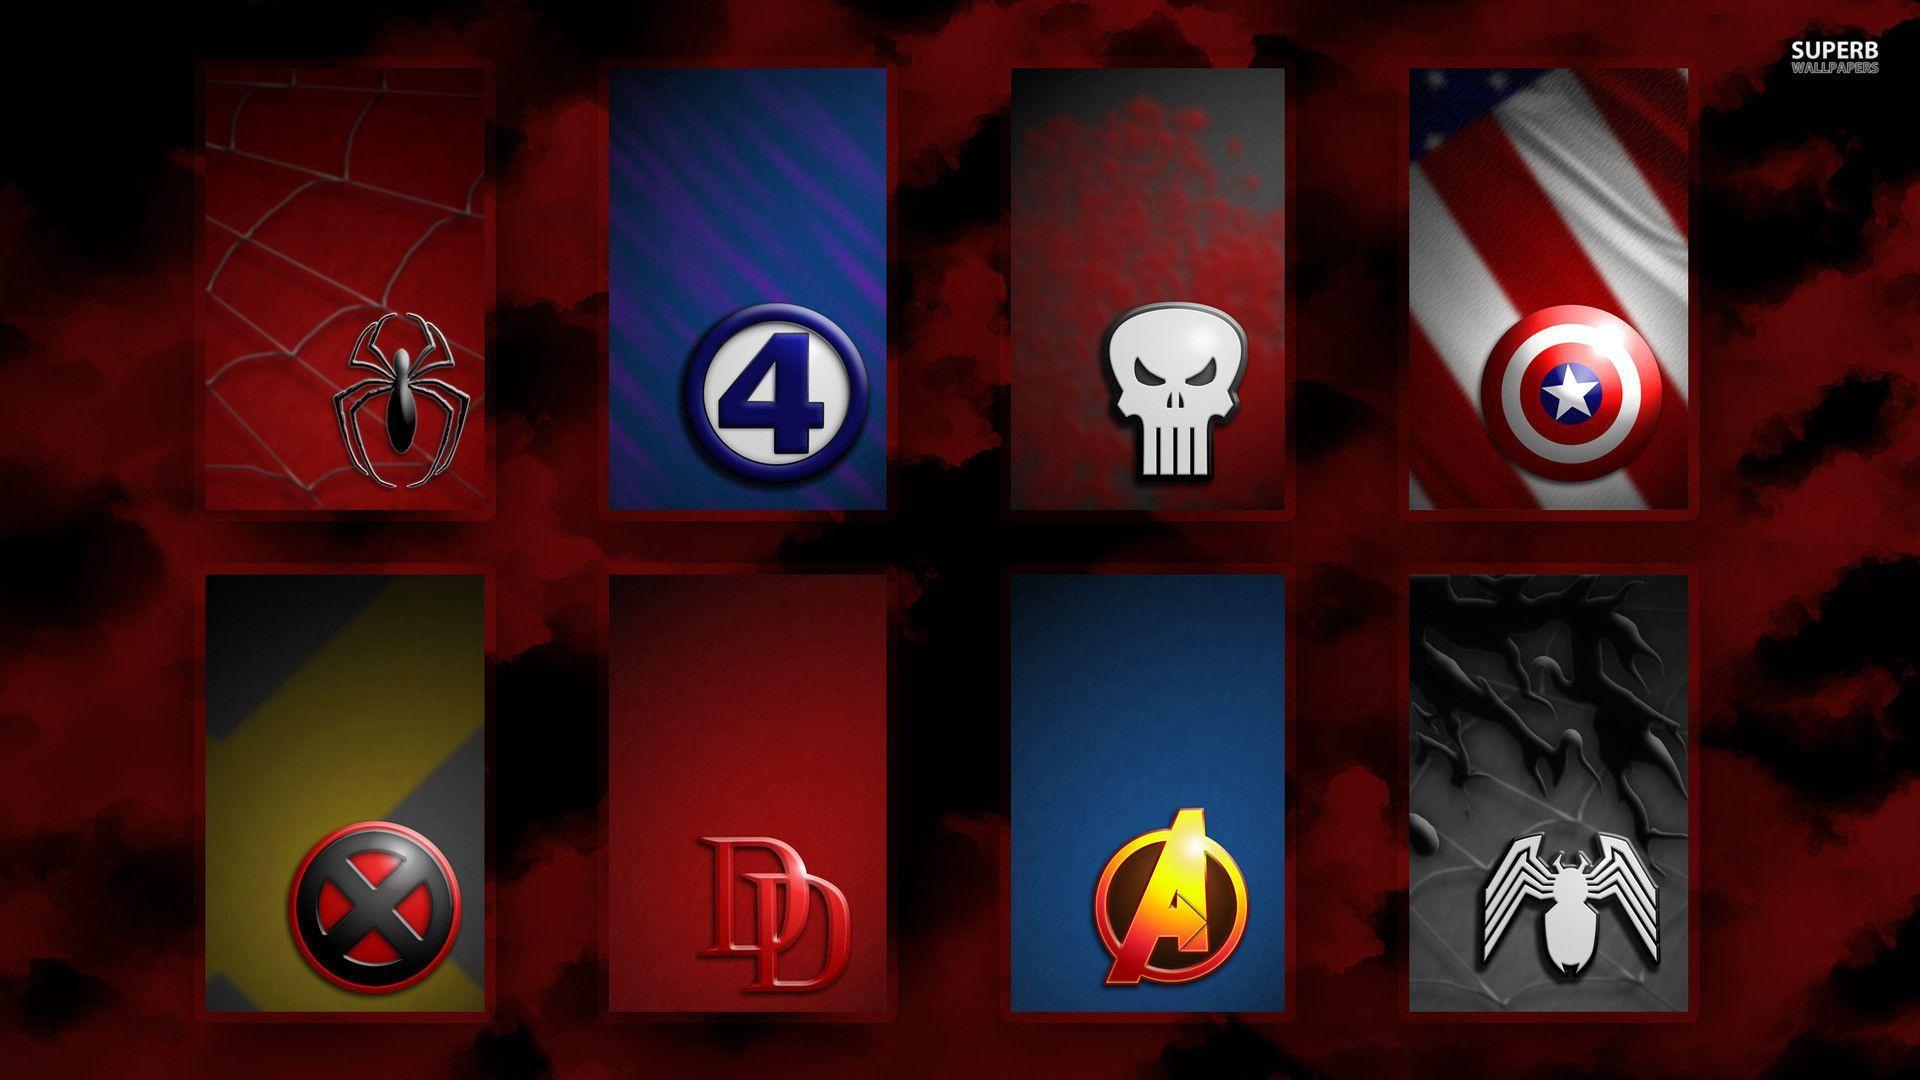 Marvel Superheroes Wallpaper Hd Sf Wallpaper